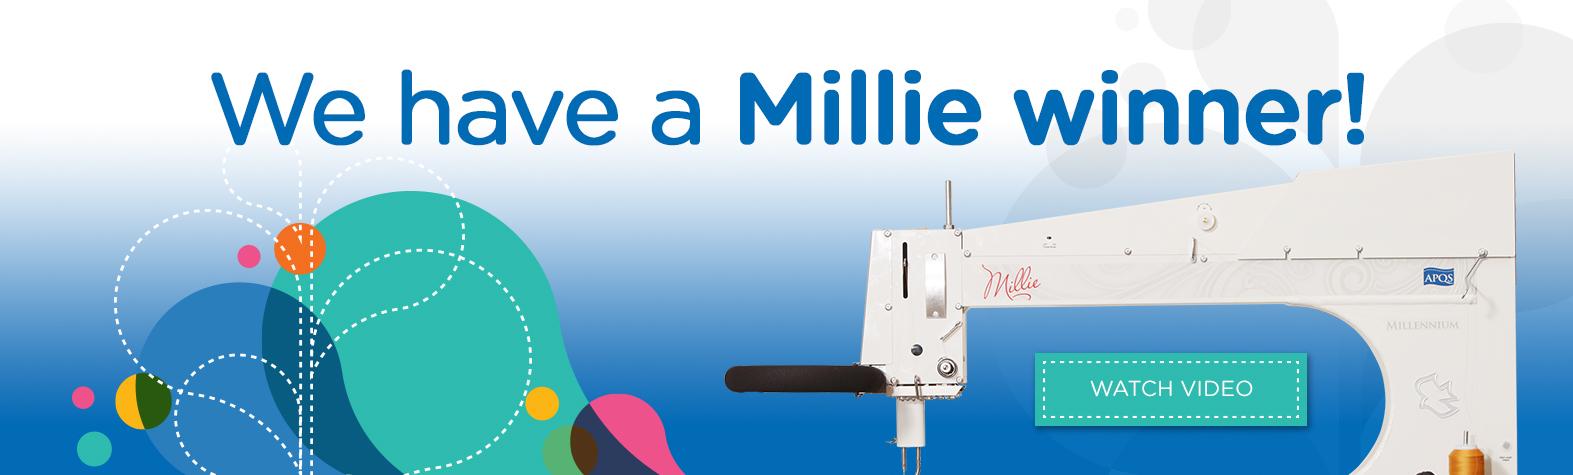 APQS Millie Winner